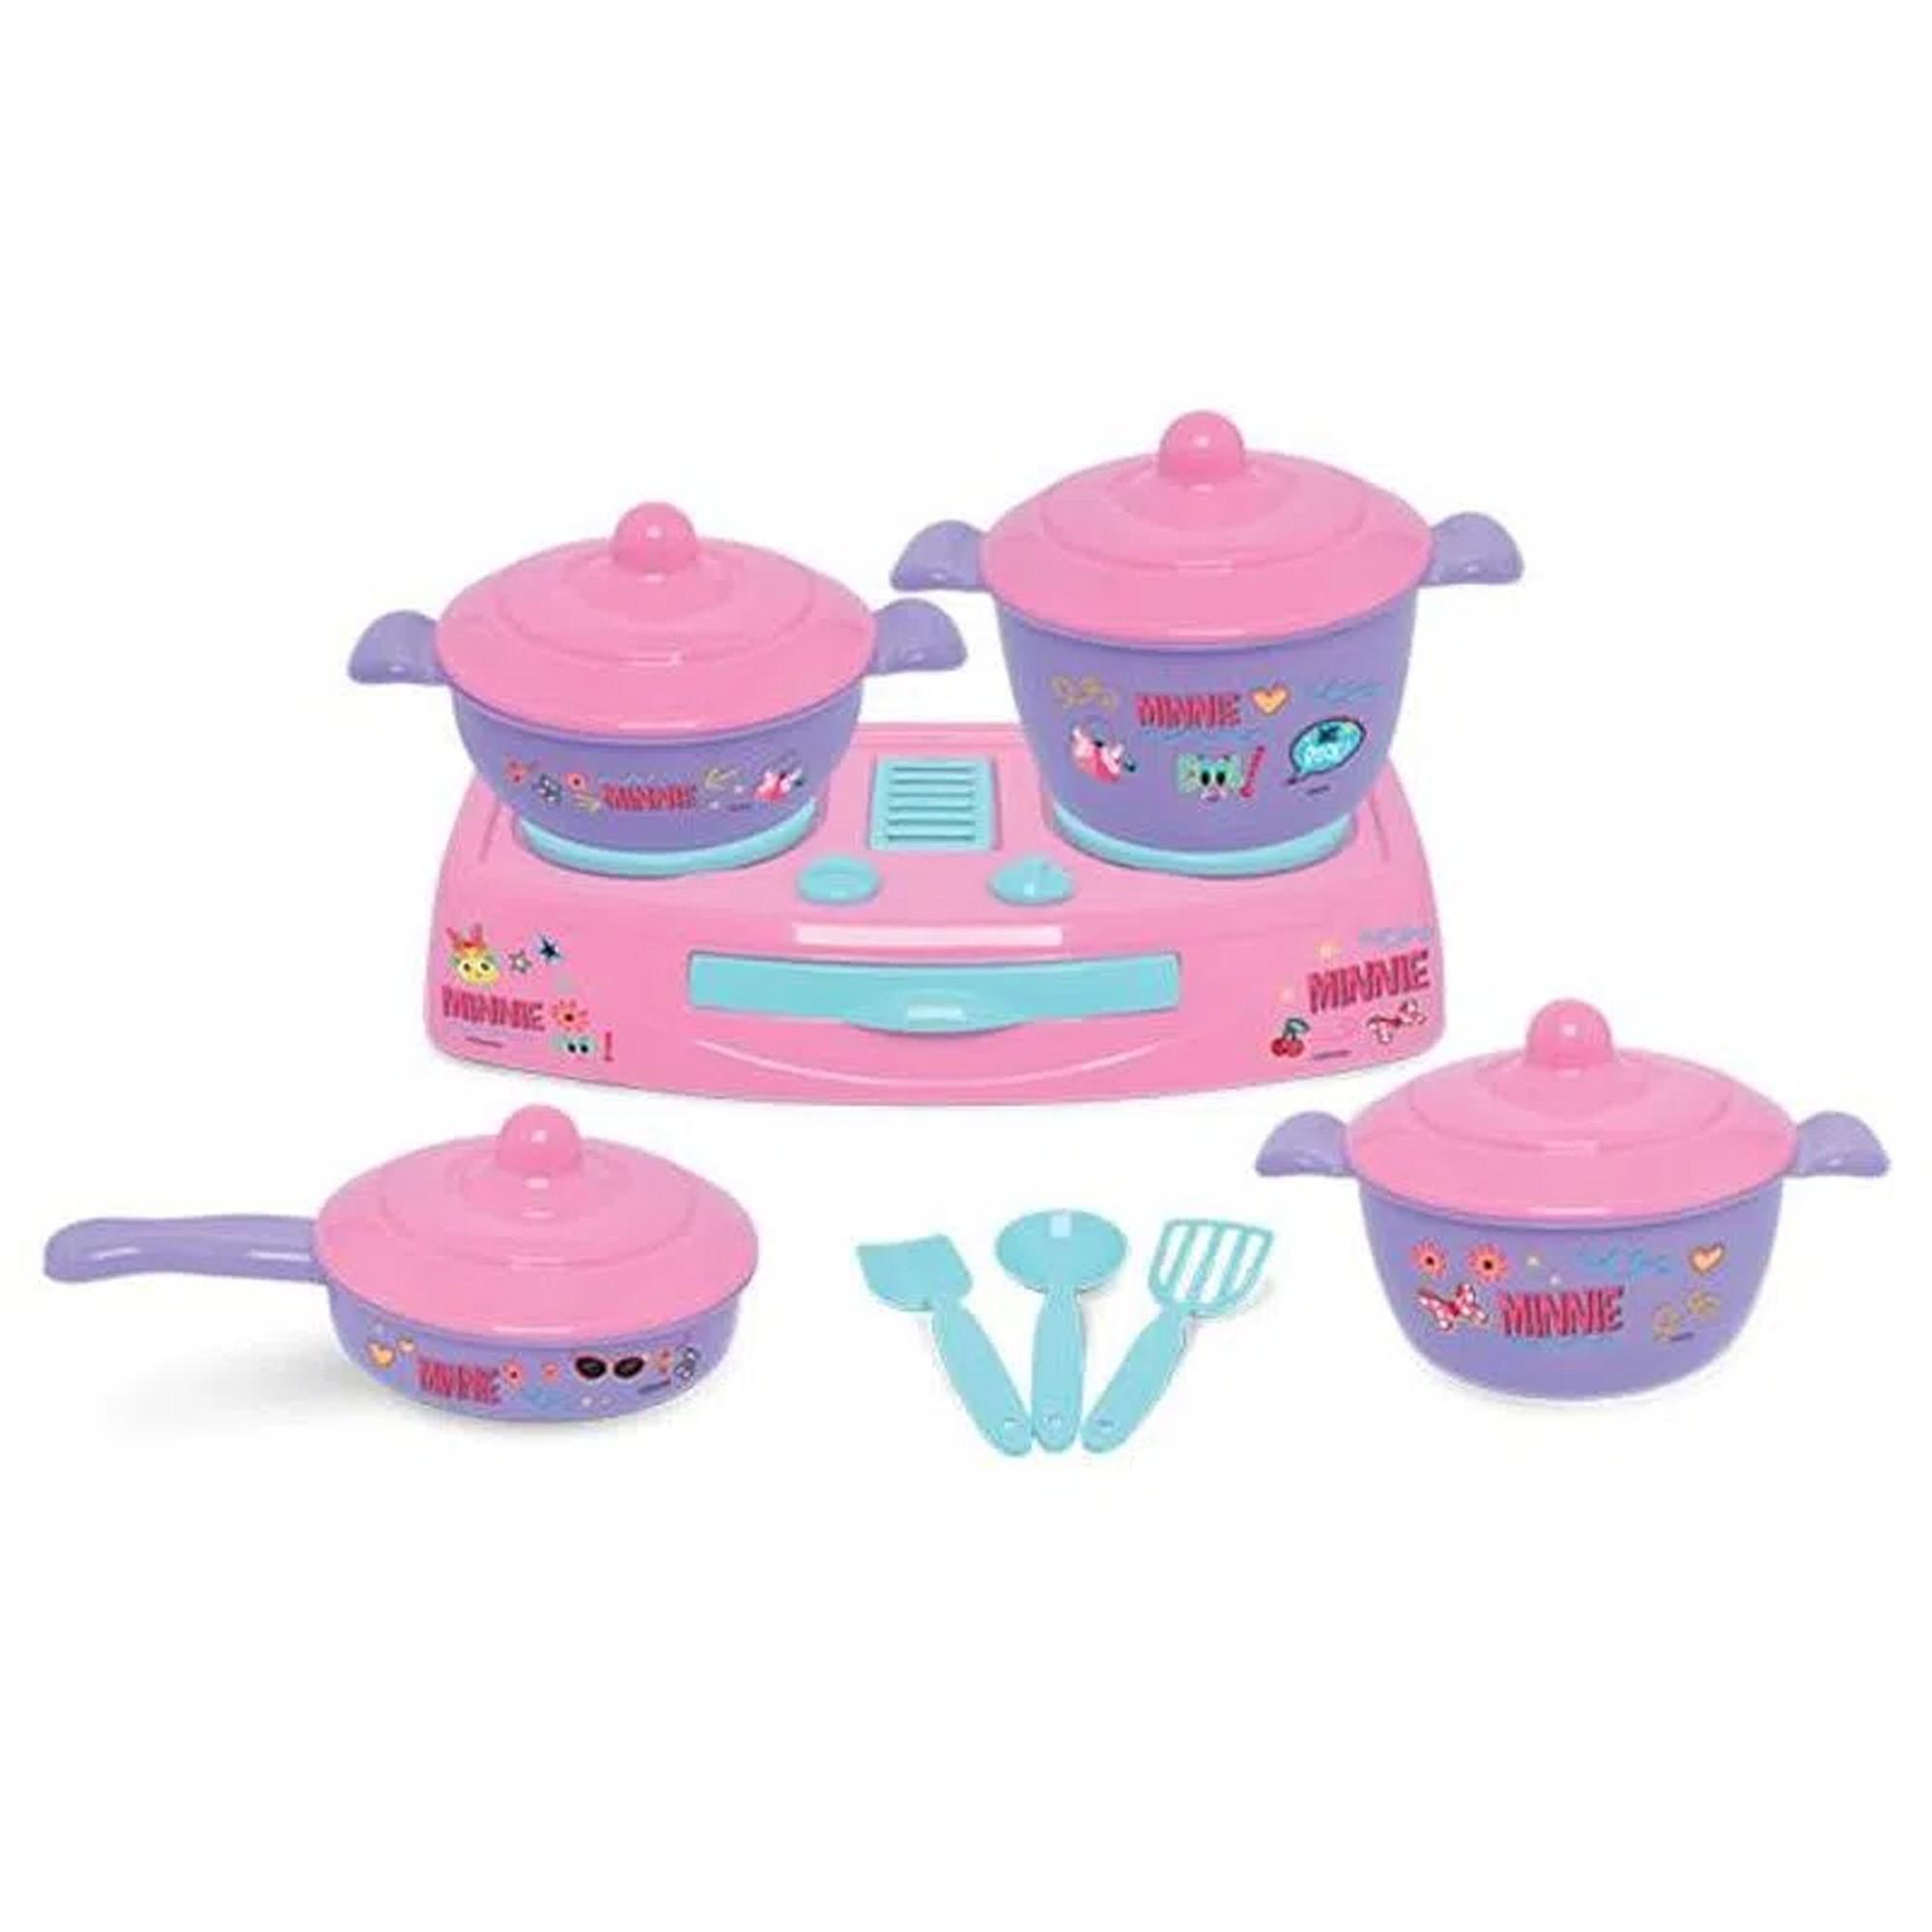 Kit Cozinha Infantil Fogãozinho Panelinhas Minnie Disney - Mielle